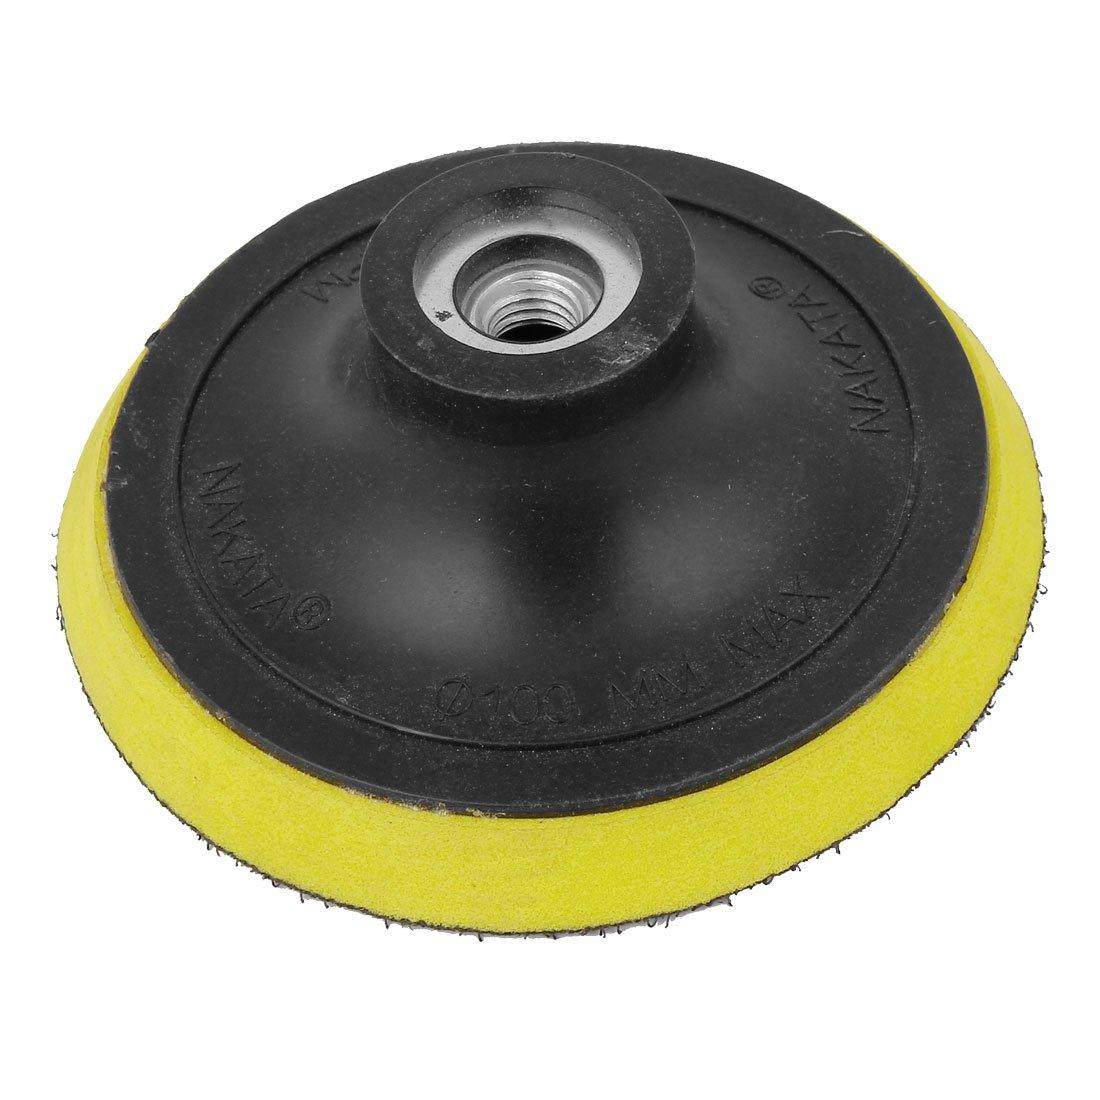 "100mm 4"" Dia Angle Grinder Sanding Polishing Hook & Loop Velcro Backing Pad db"